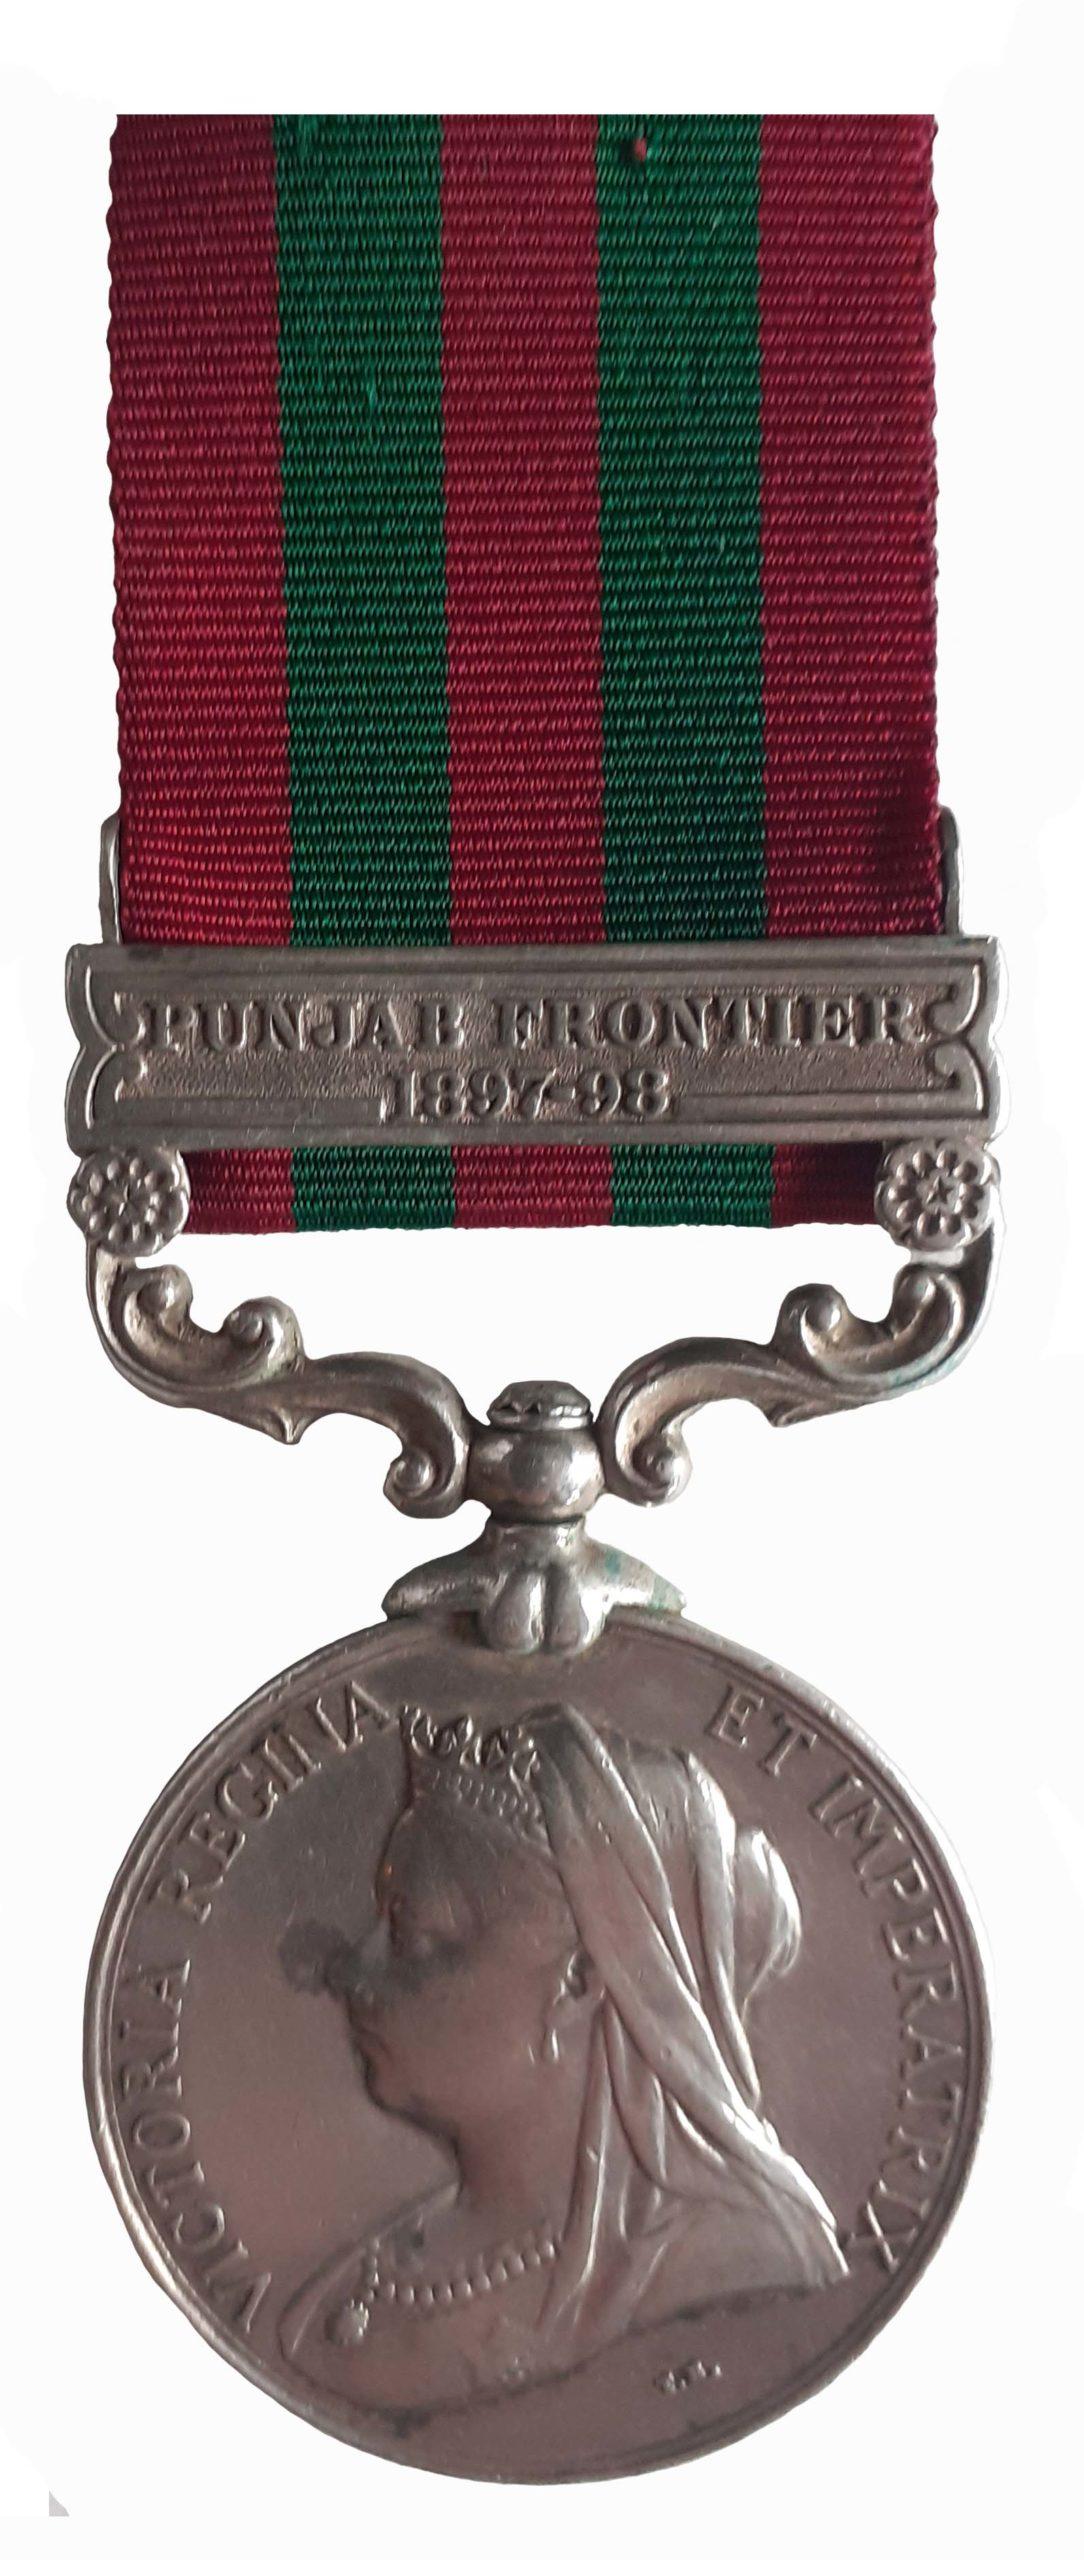 India Medal 1895-1902, QVR, one clasp Punjab Frontier 1897-98, to Rifleman Diwansing Thapa